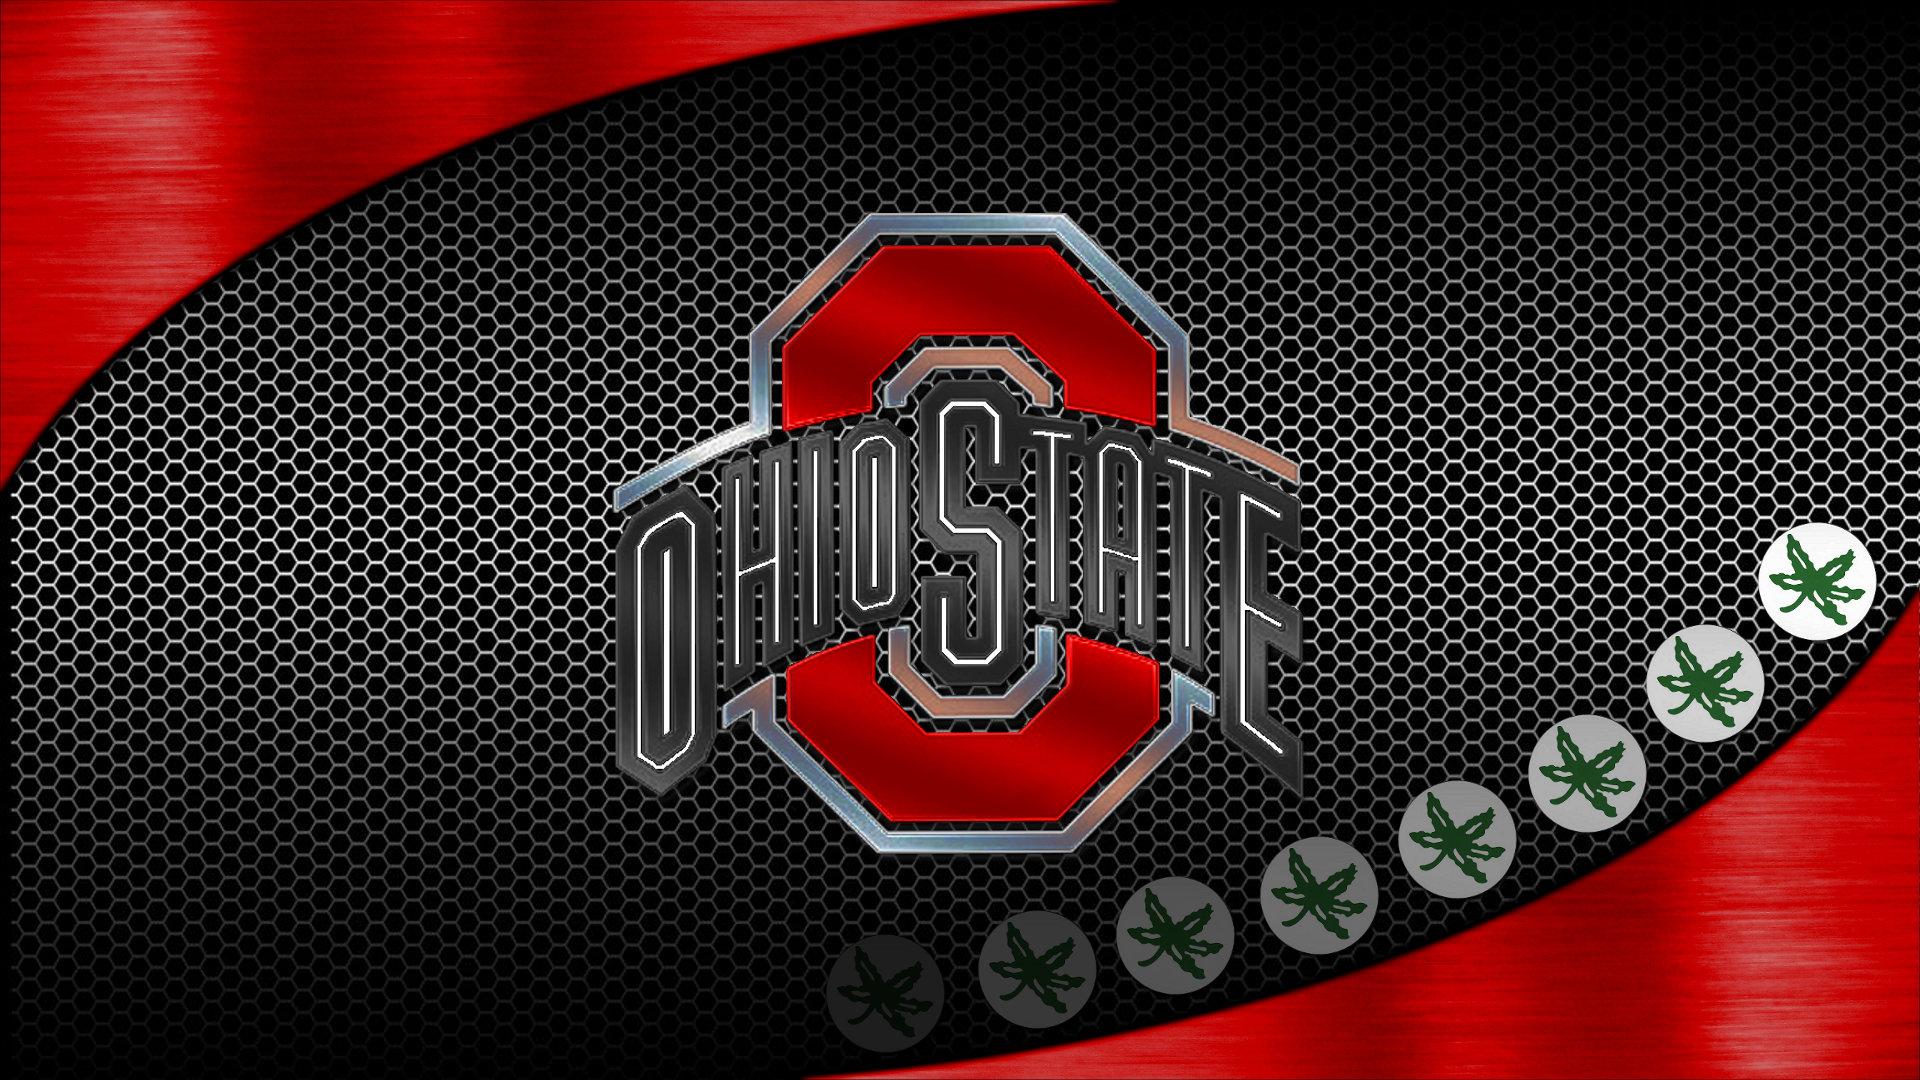 OSU Wallpaper 532 Ohio State Buckeyes Pinterest 1920x1080